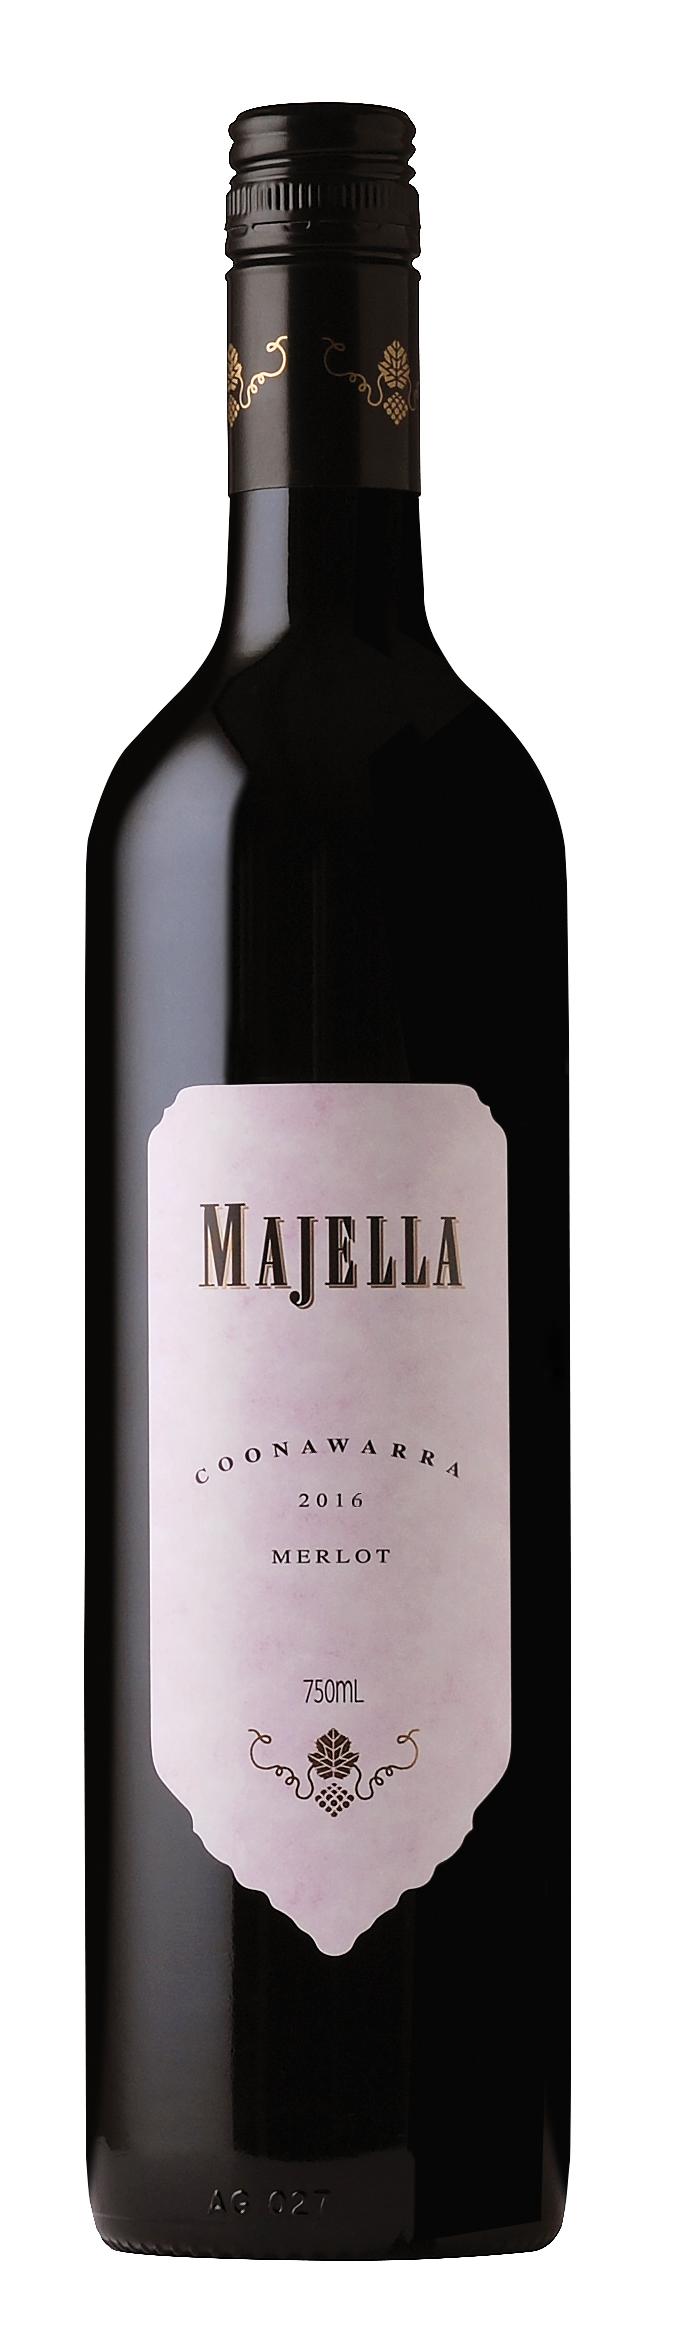 Photo of Merlot wine bottle